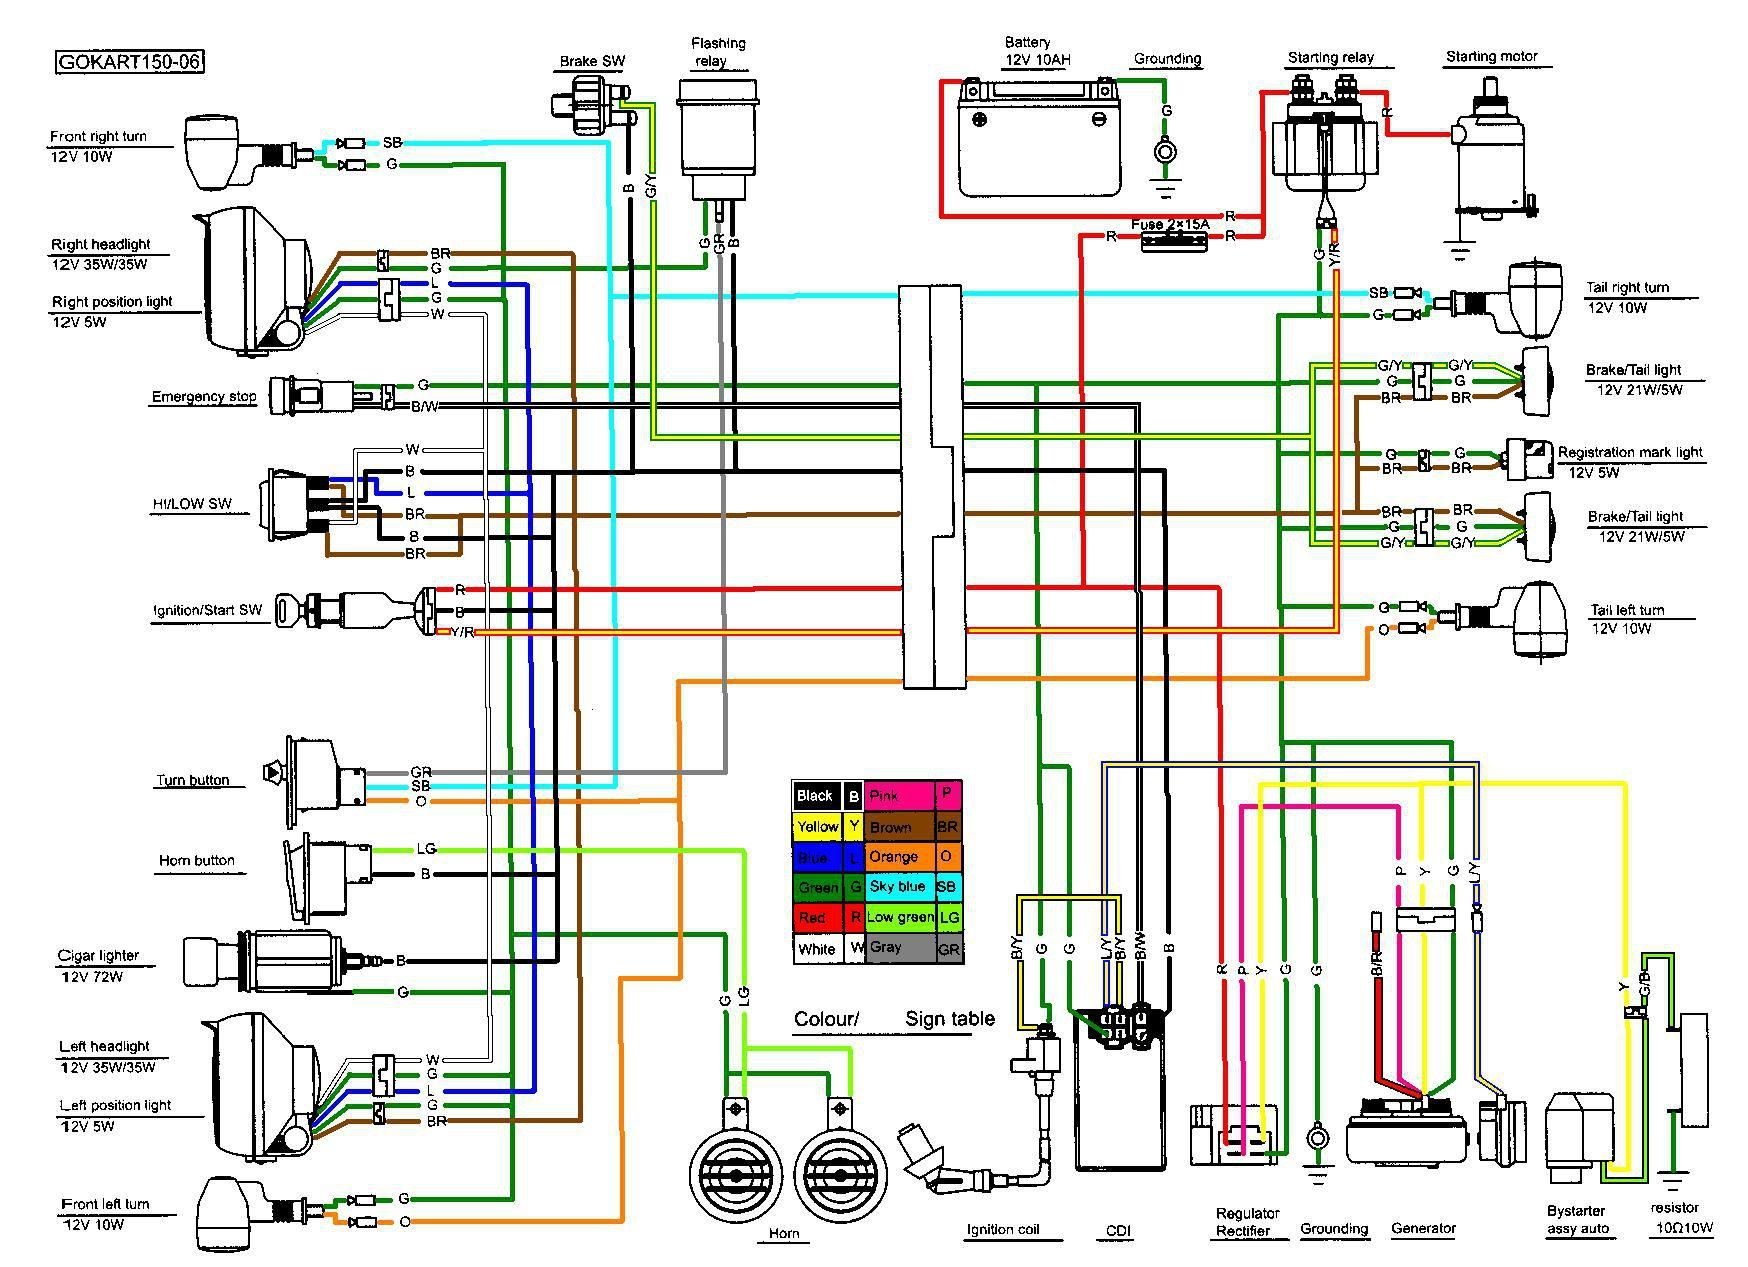 150cc go kart wiring diagram best of gy6 kandi with [ 1748 x 1267 Pixel ]